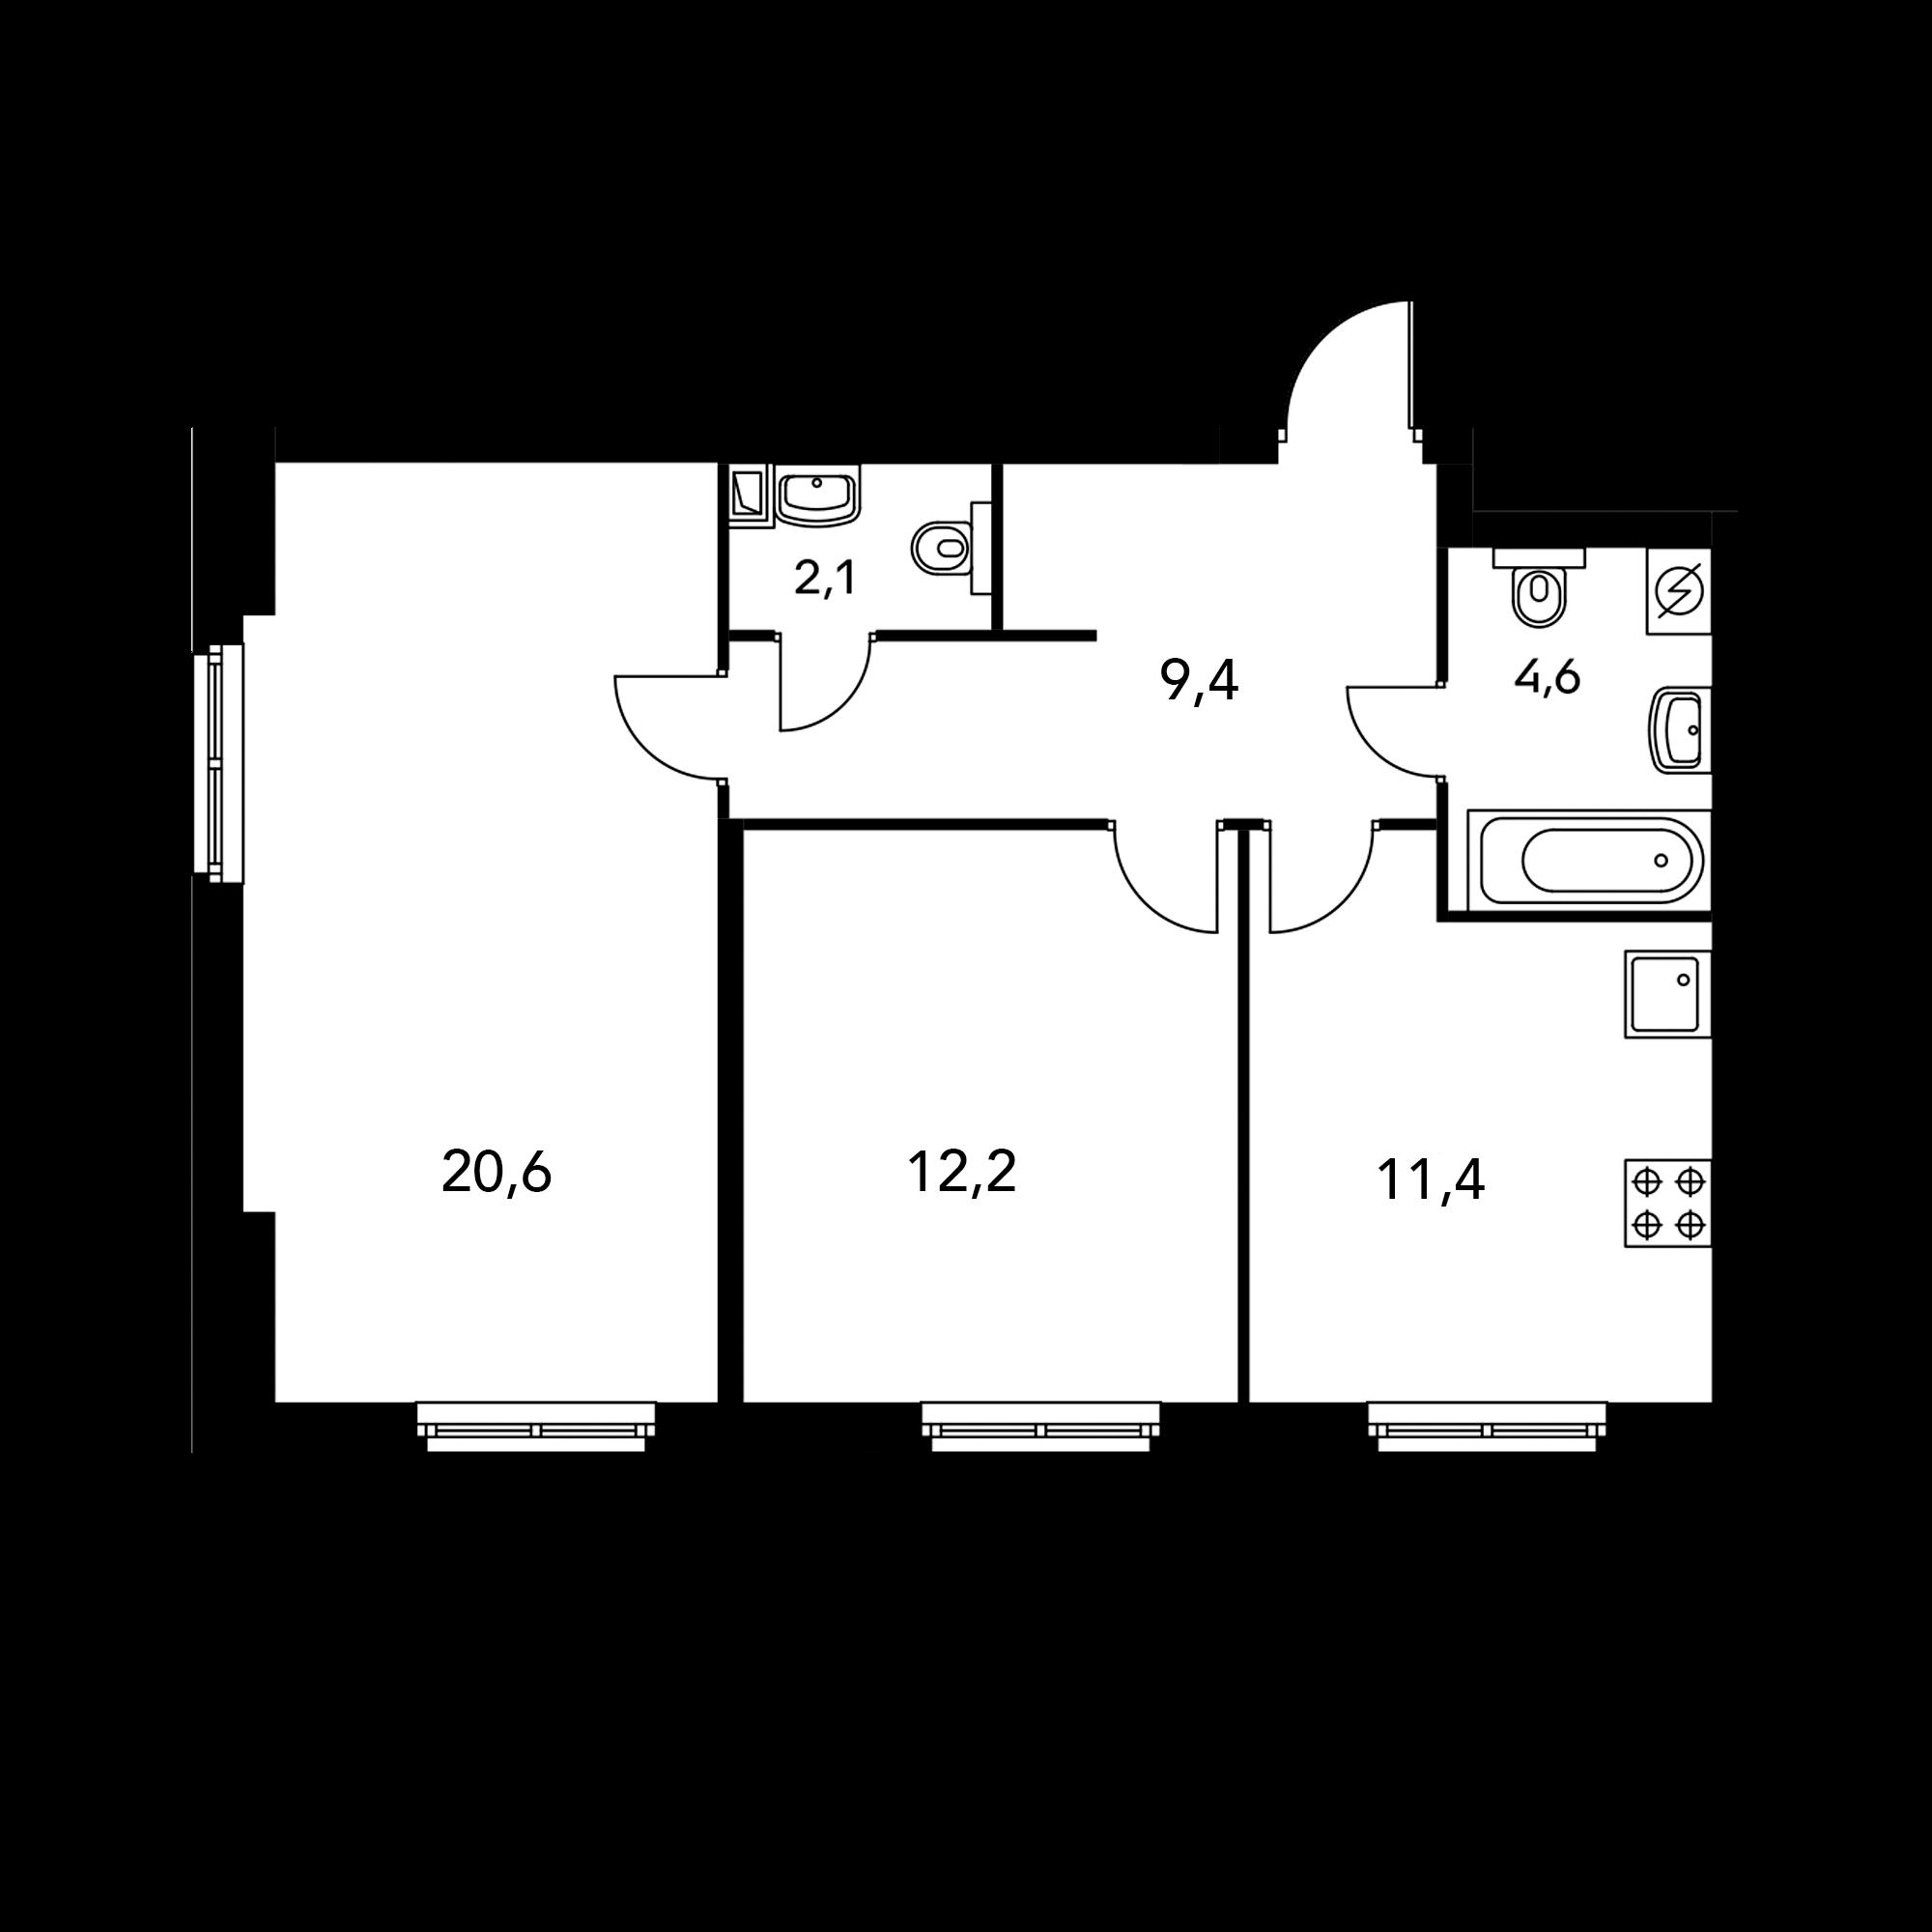 2KM6_10.2